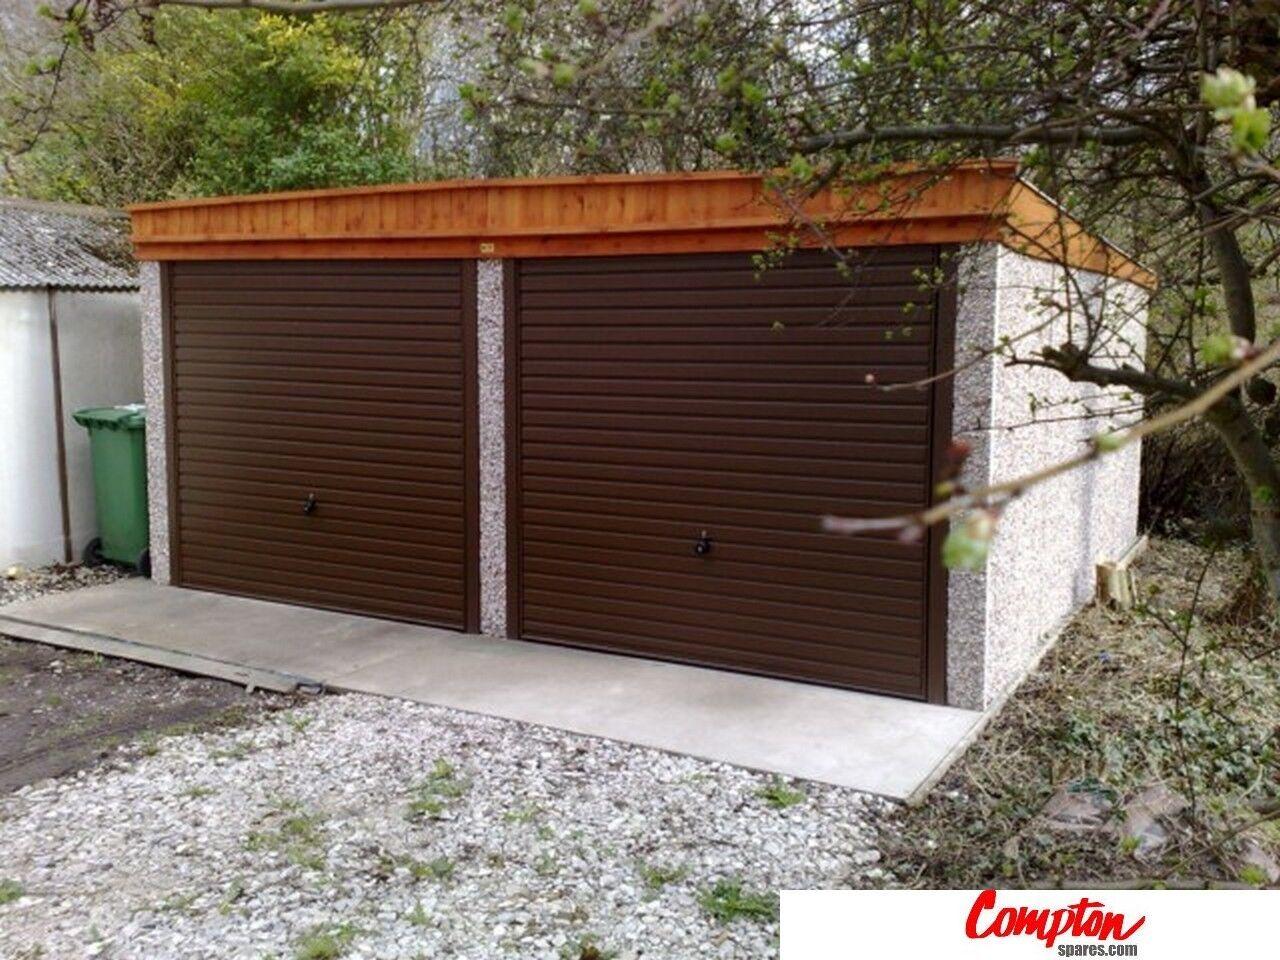 Prefab Garages Buildings Double Pent Roof Garage 16ft6in W X 18ft3in L Ebay